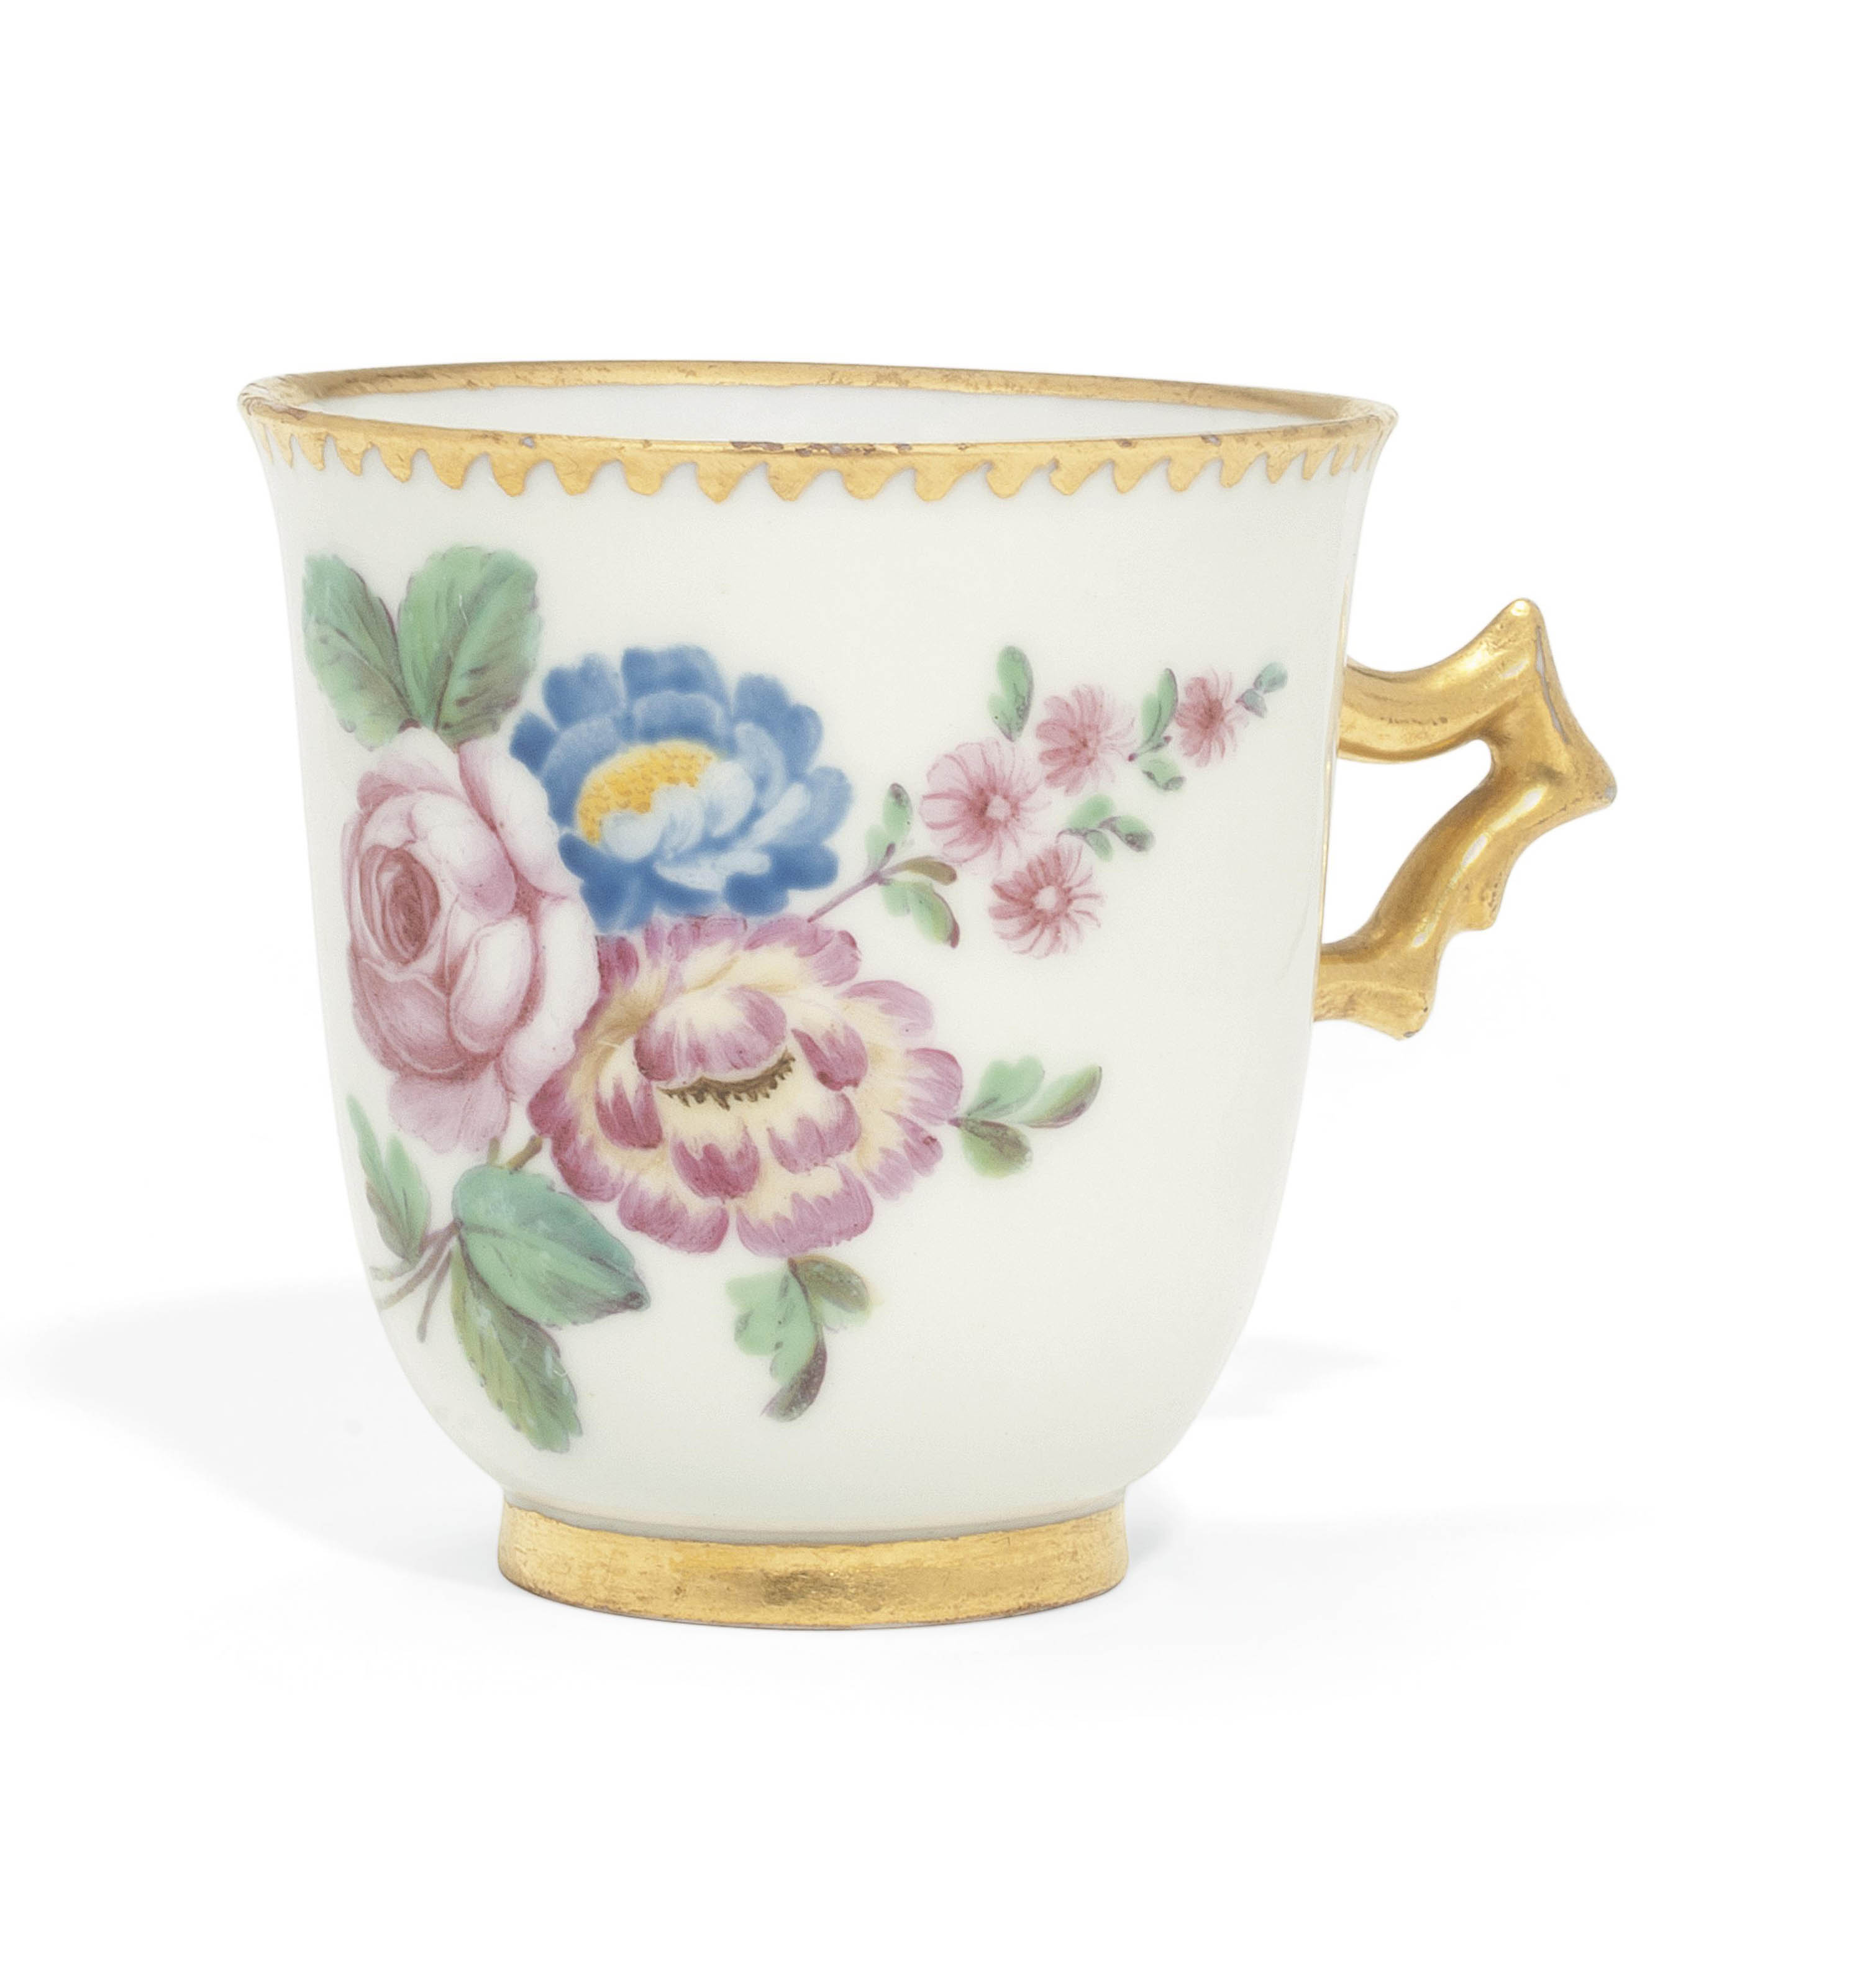 A NAPLES (REAL FABBRICA FERDINANDEA) CHOCOLATE-CUP